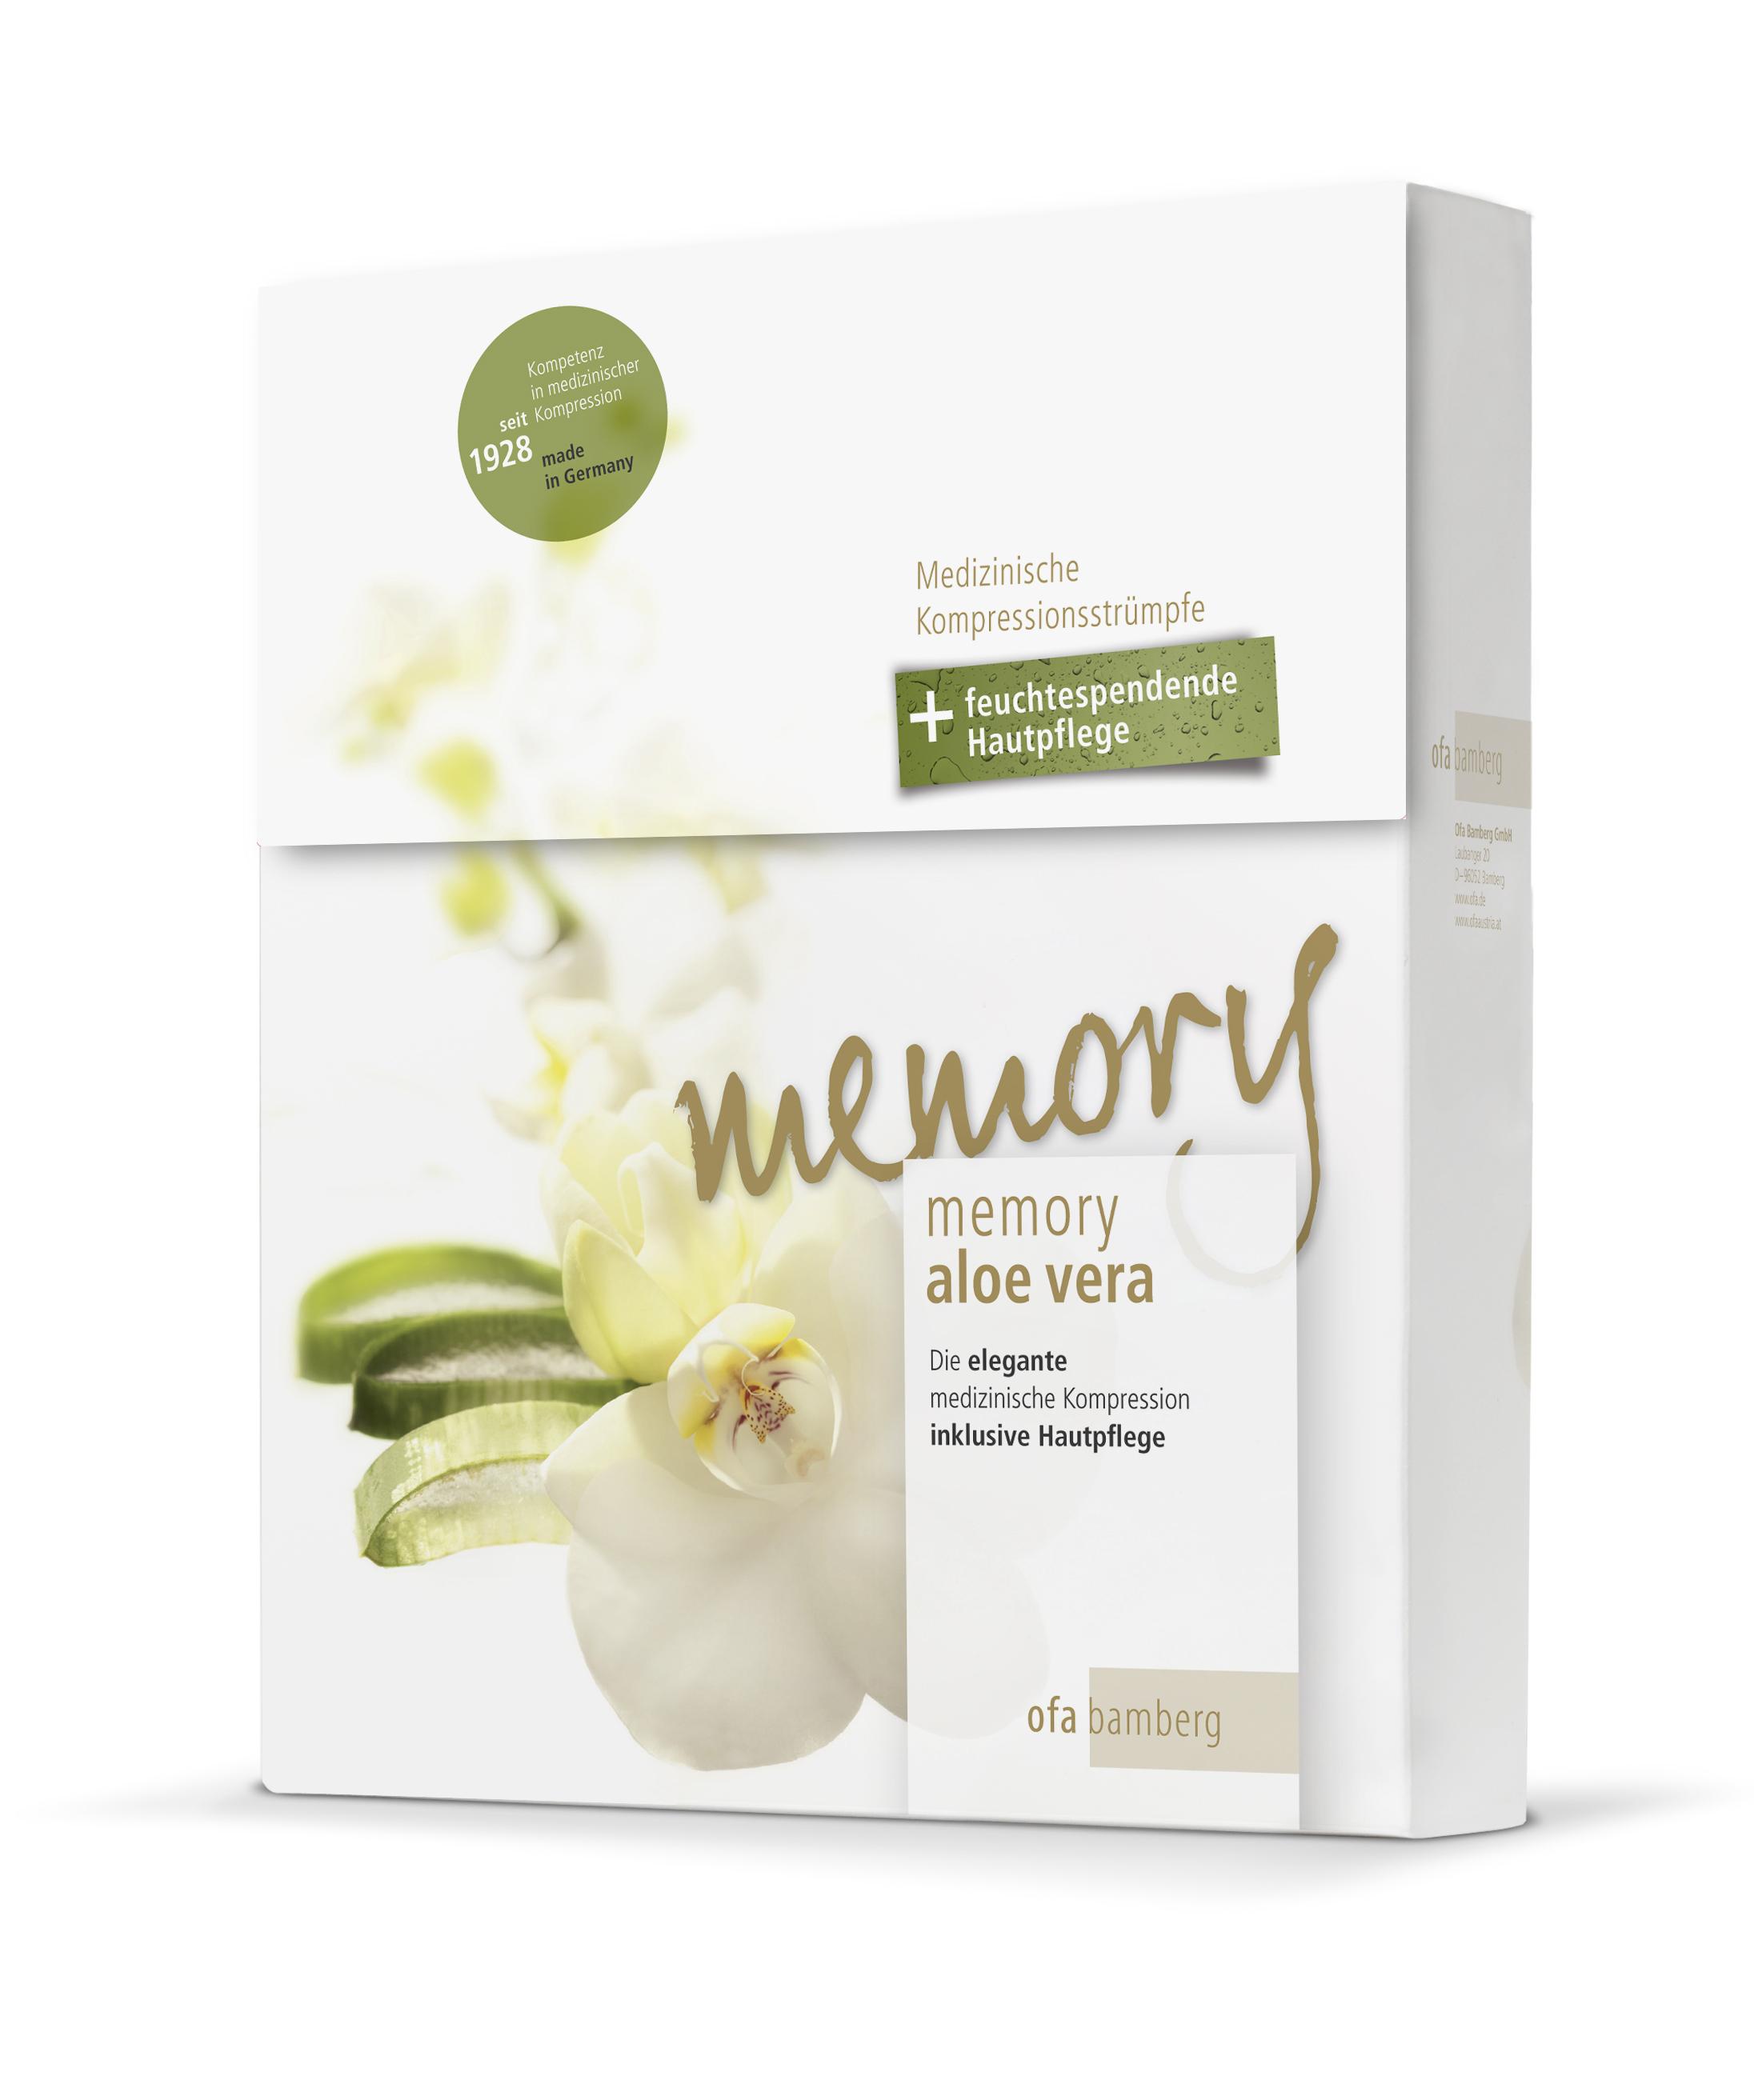 mr_memory_packung_aloe-vera_2010_101123